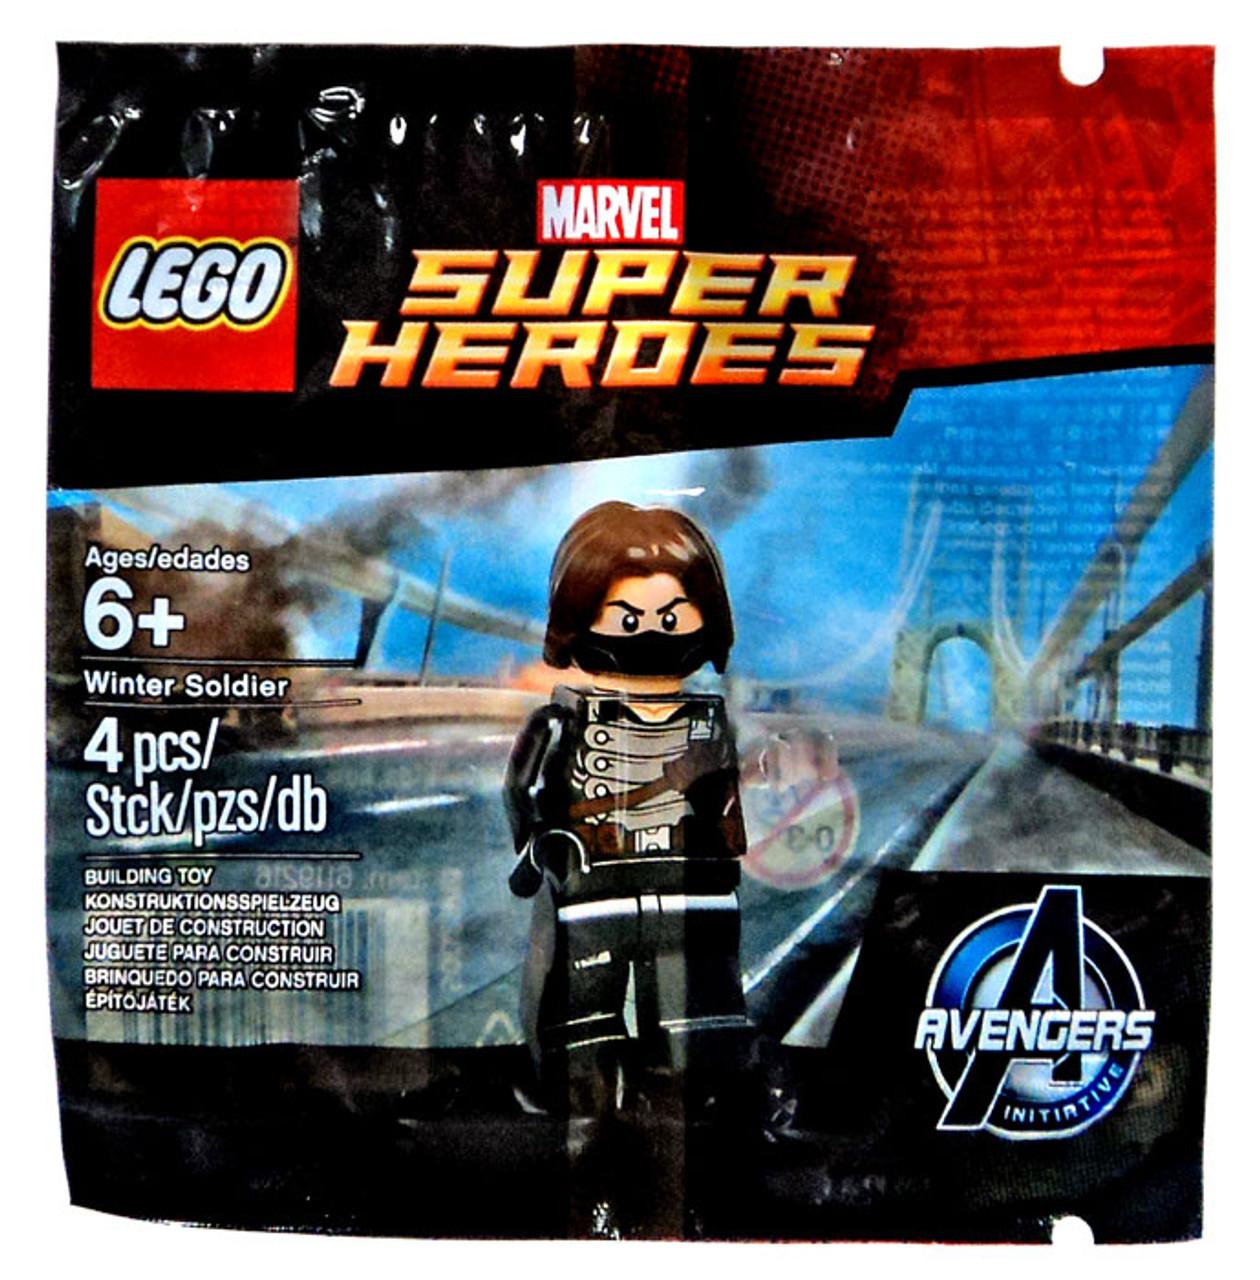 LEGO Marvel Super Heroes Avengers Initiative Winter Soldier Set ...